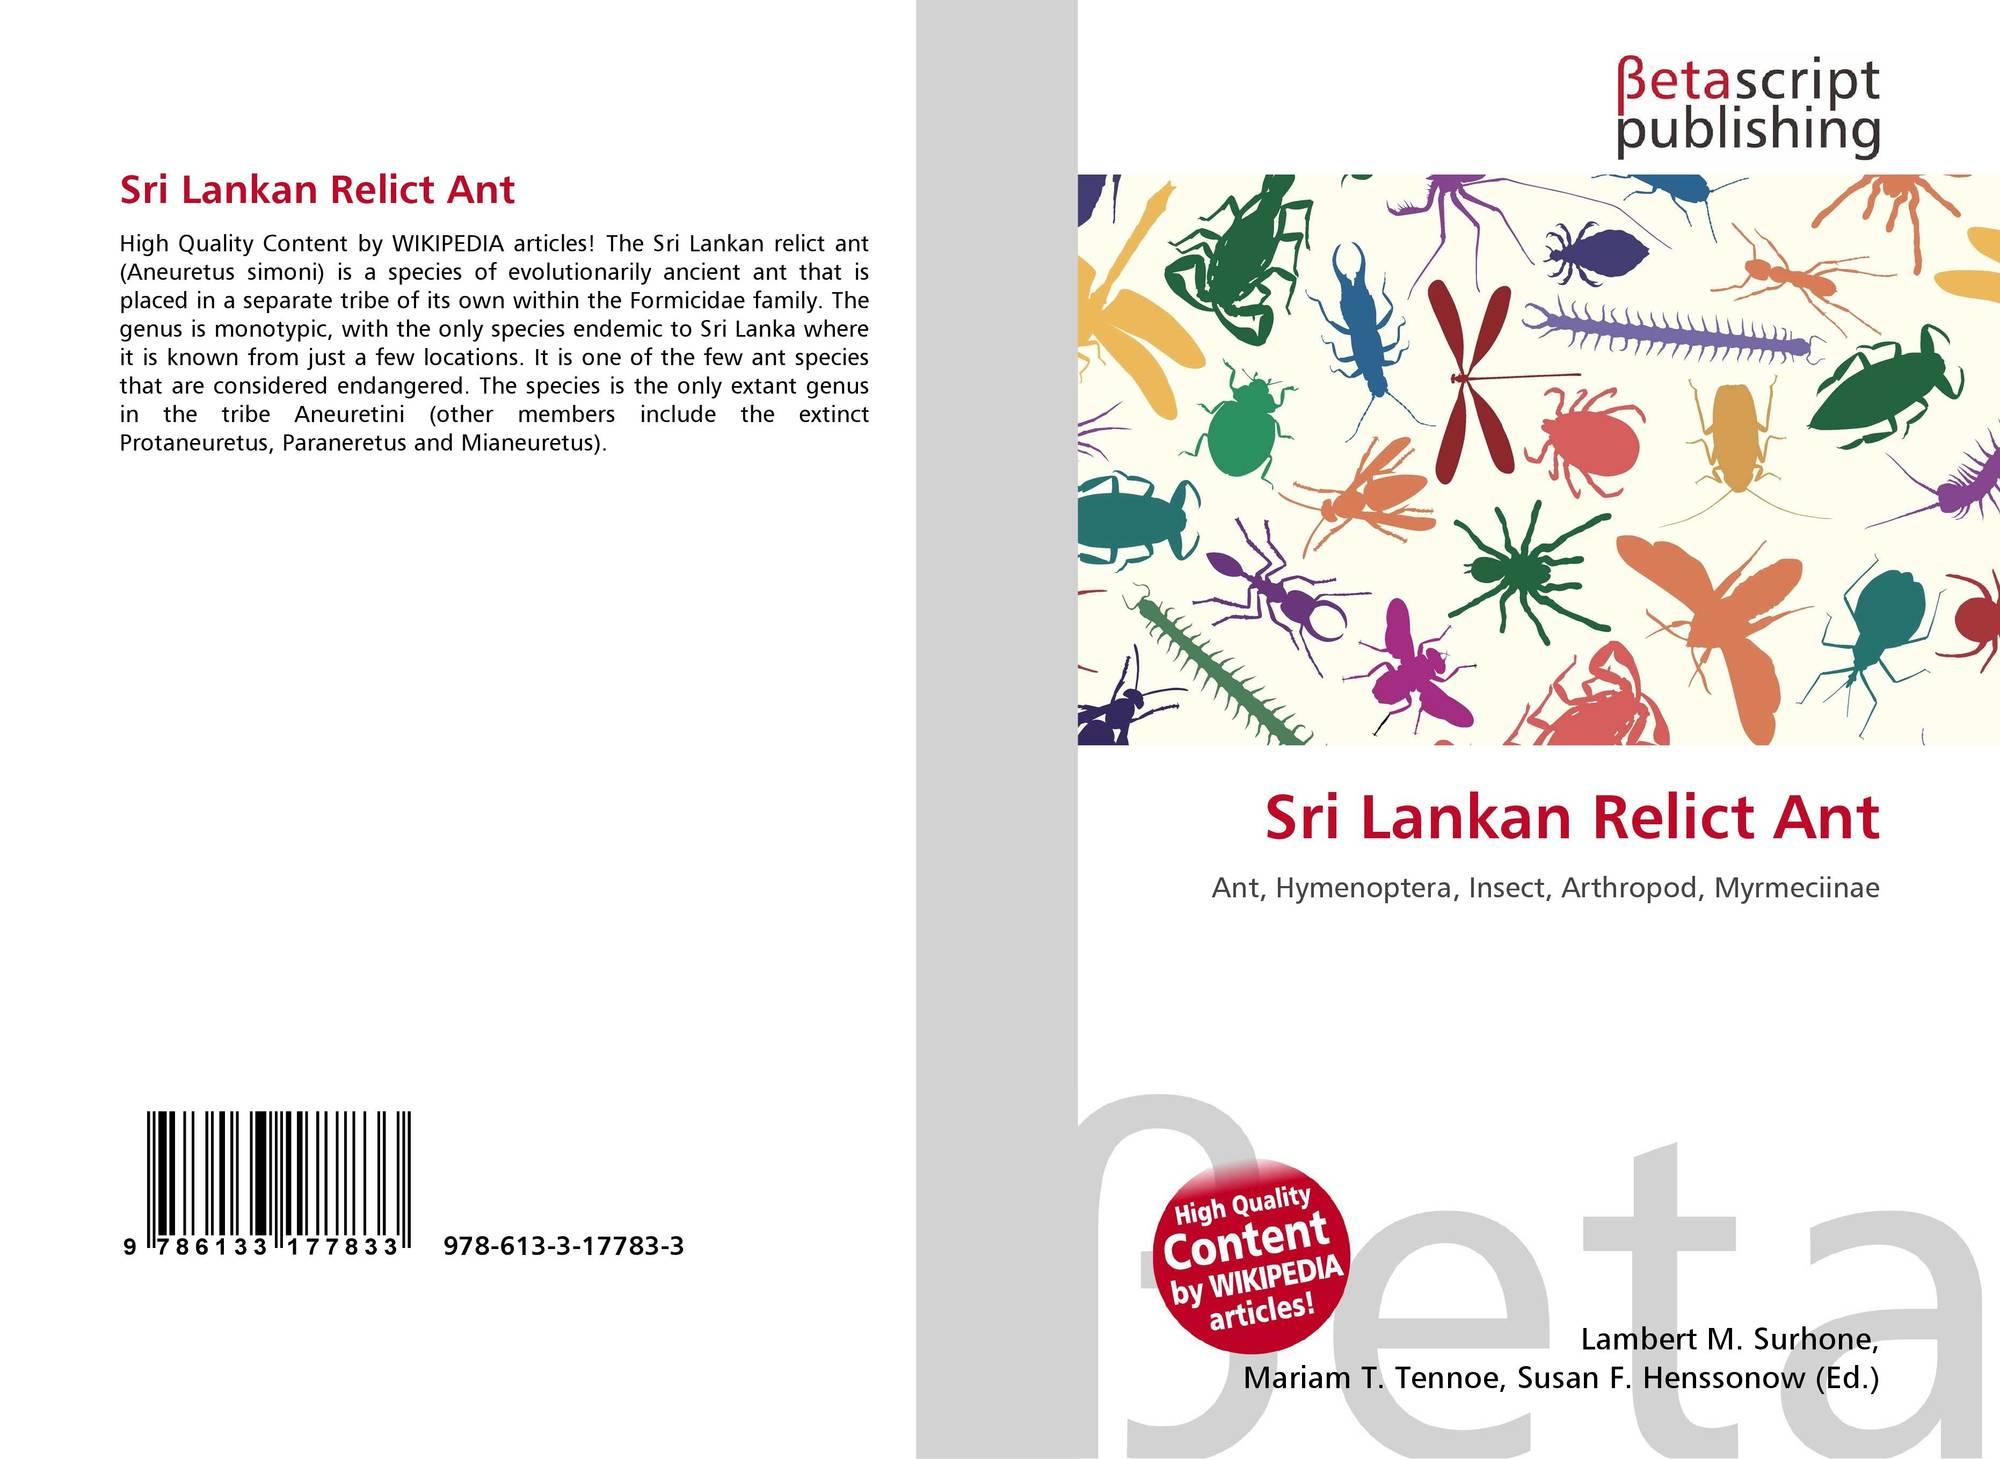 Sri Lankan Relict Ant, 978-613-3-17783-3, 6133177837 ,9786133177833